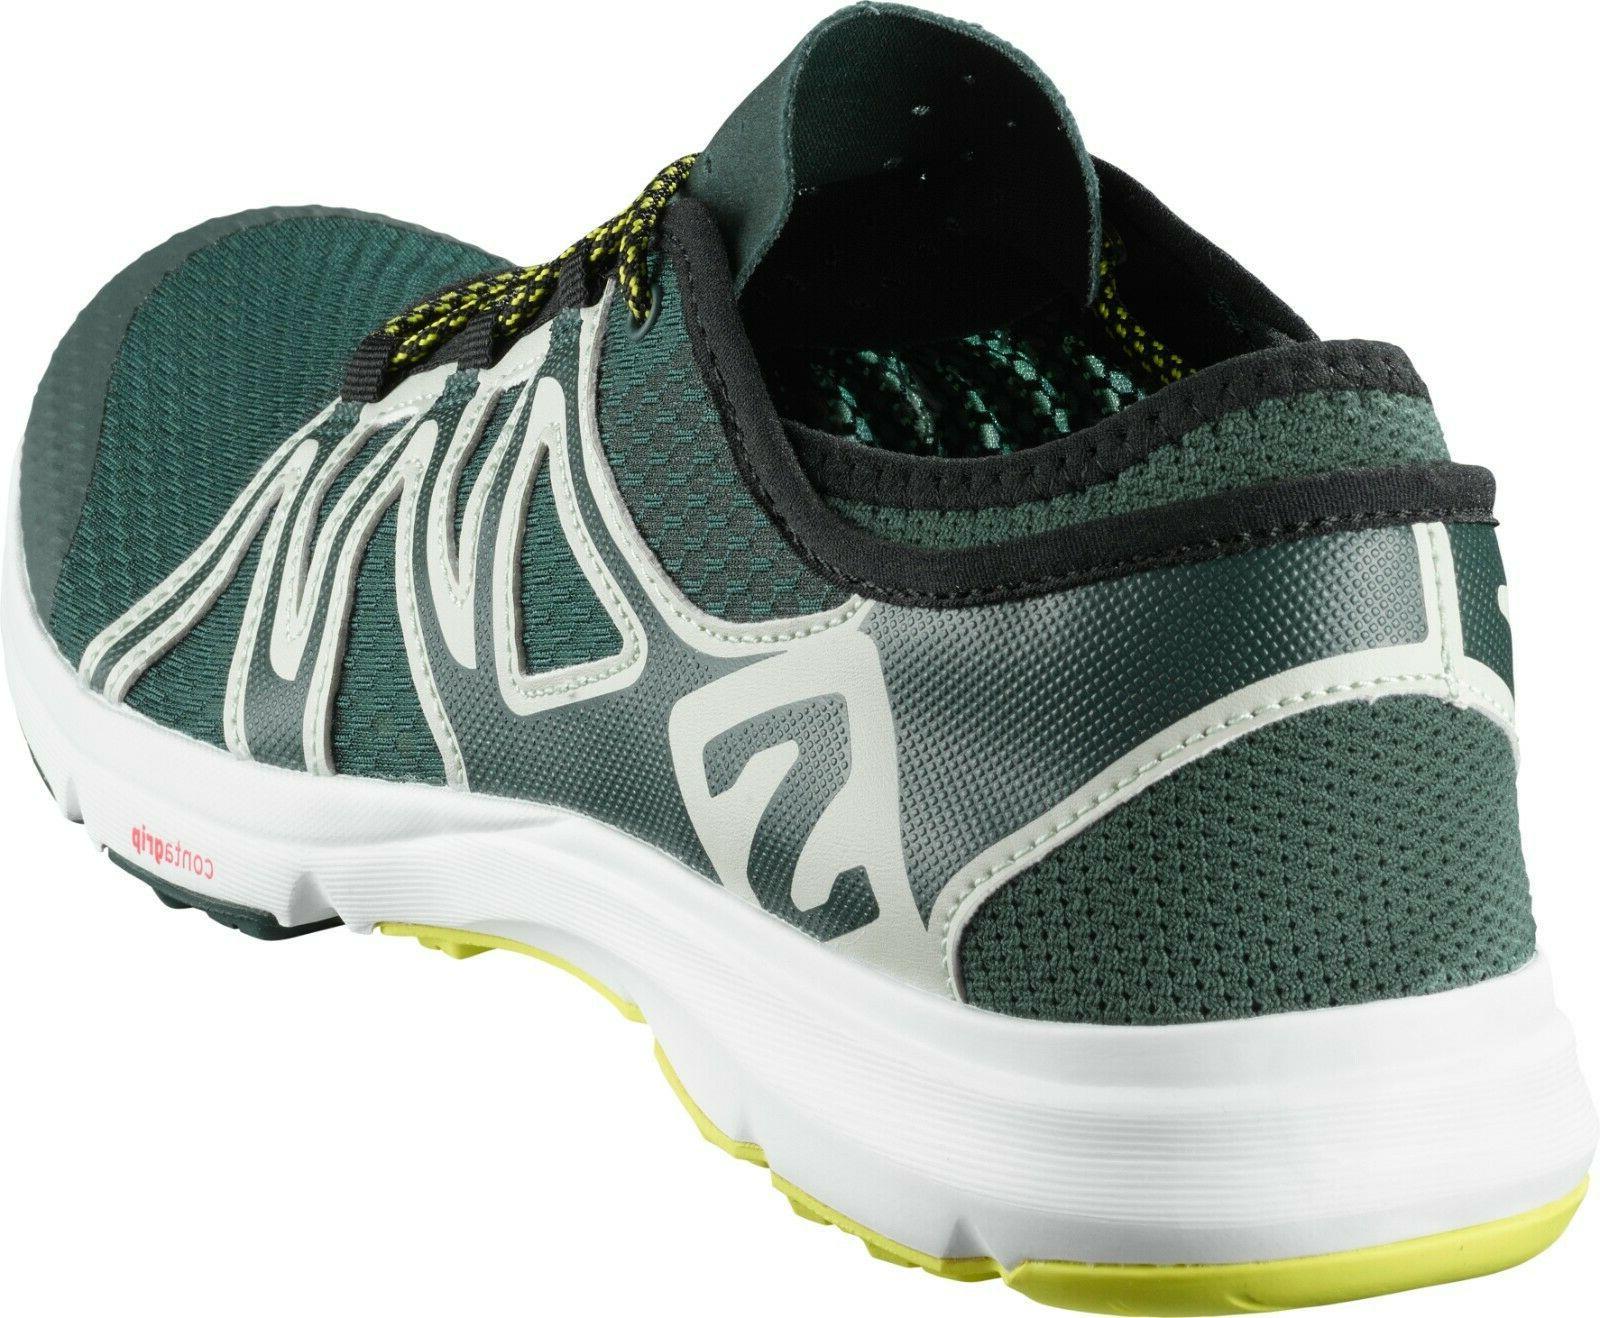 Salomon GENUINE Water Shoes SWIFT 9US